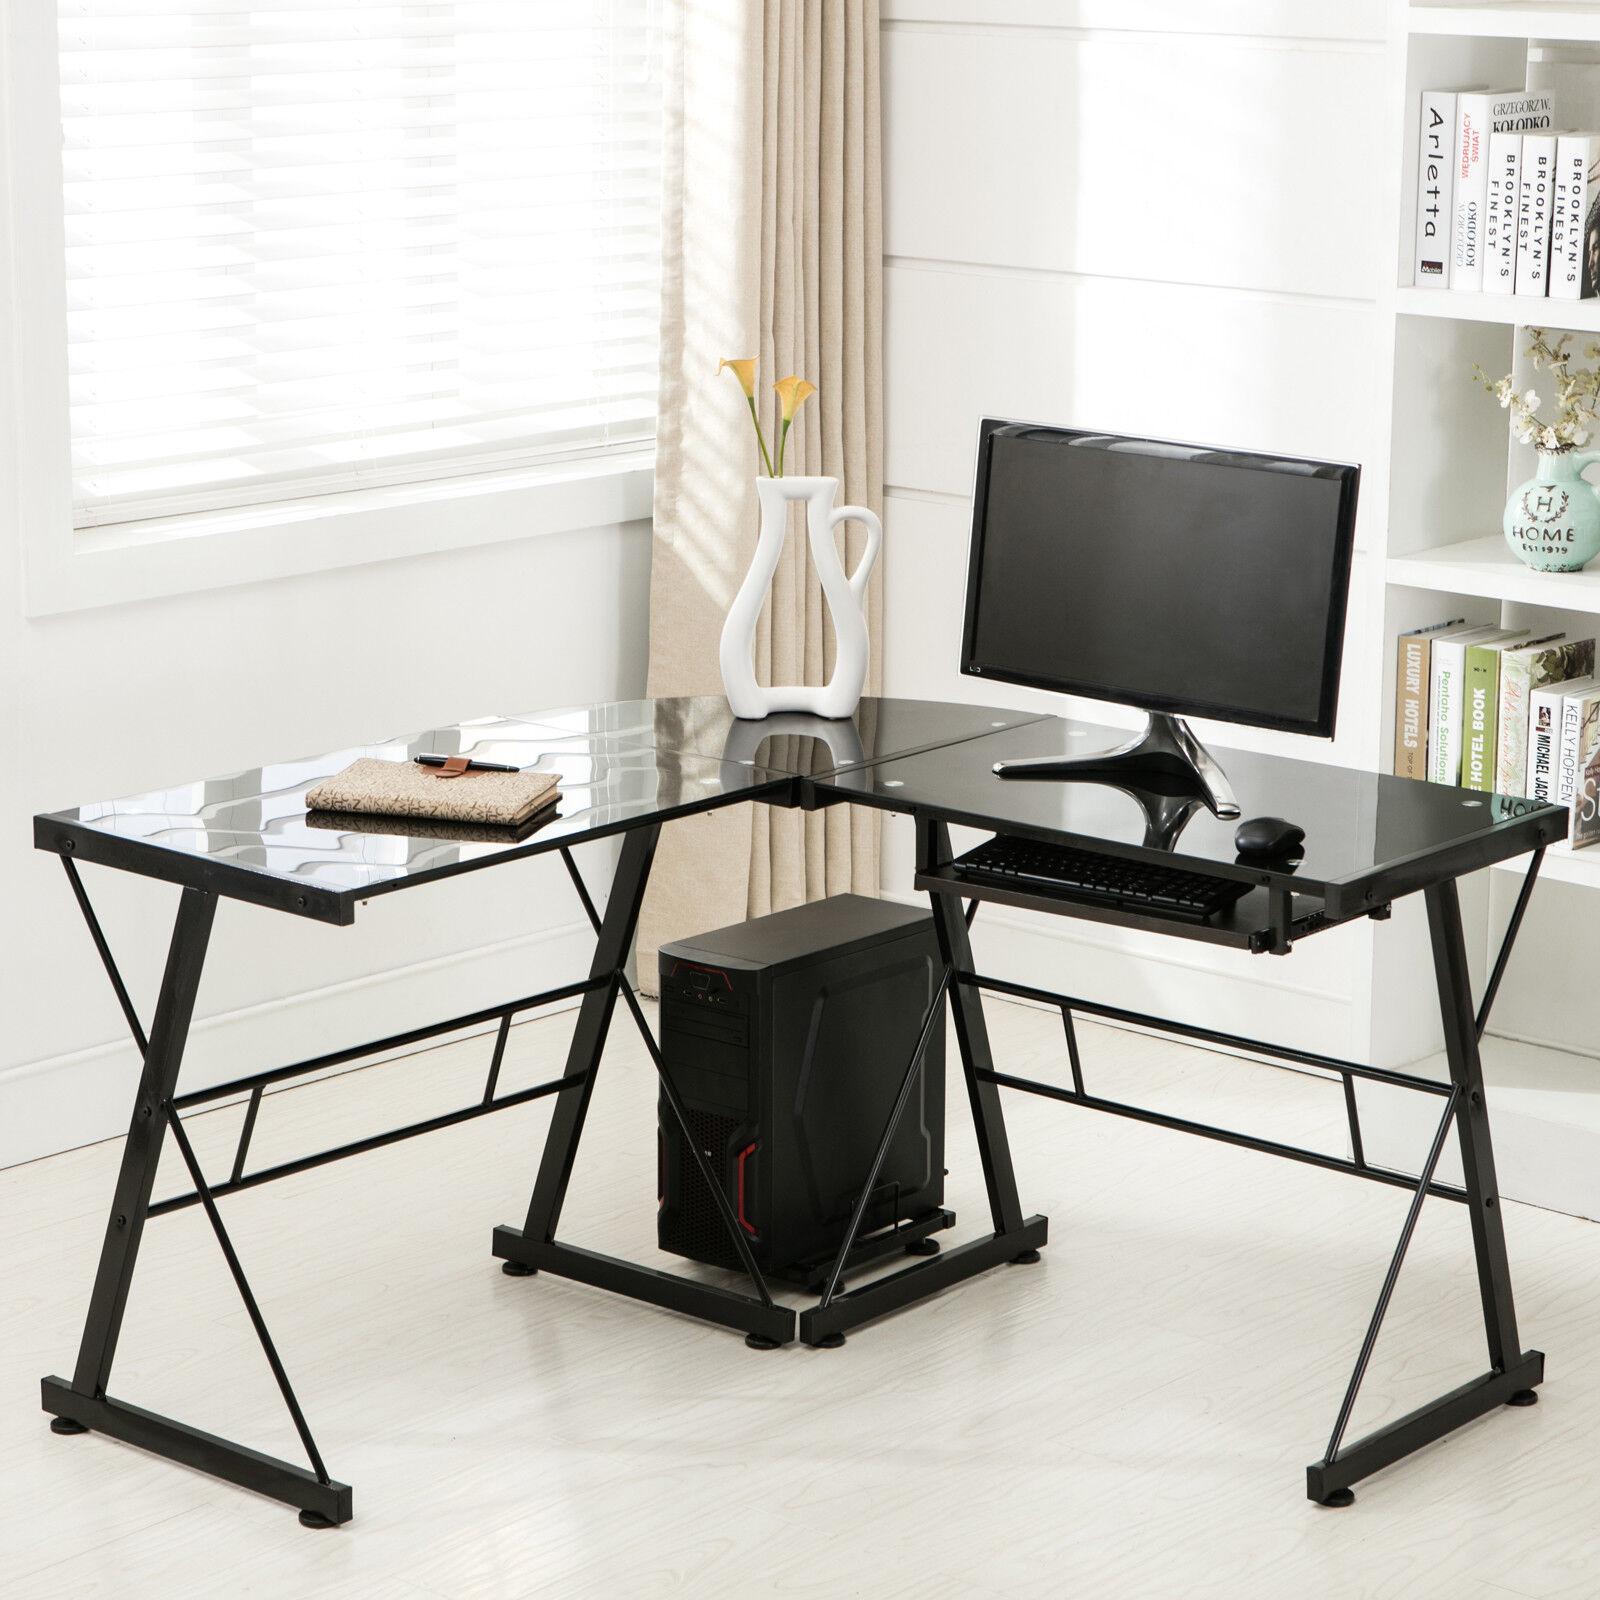 L-Shape Computer Desk Glass Corner Laptop PC Table Workstation Home Office  Black